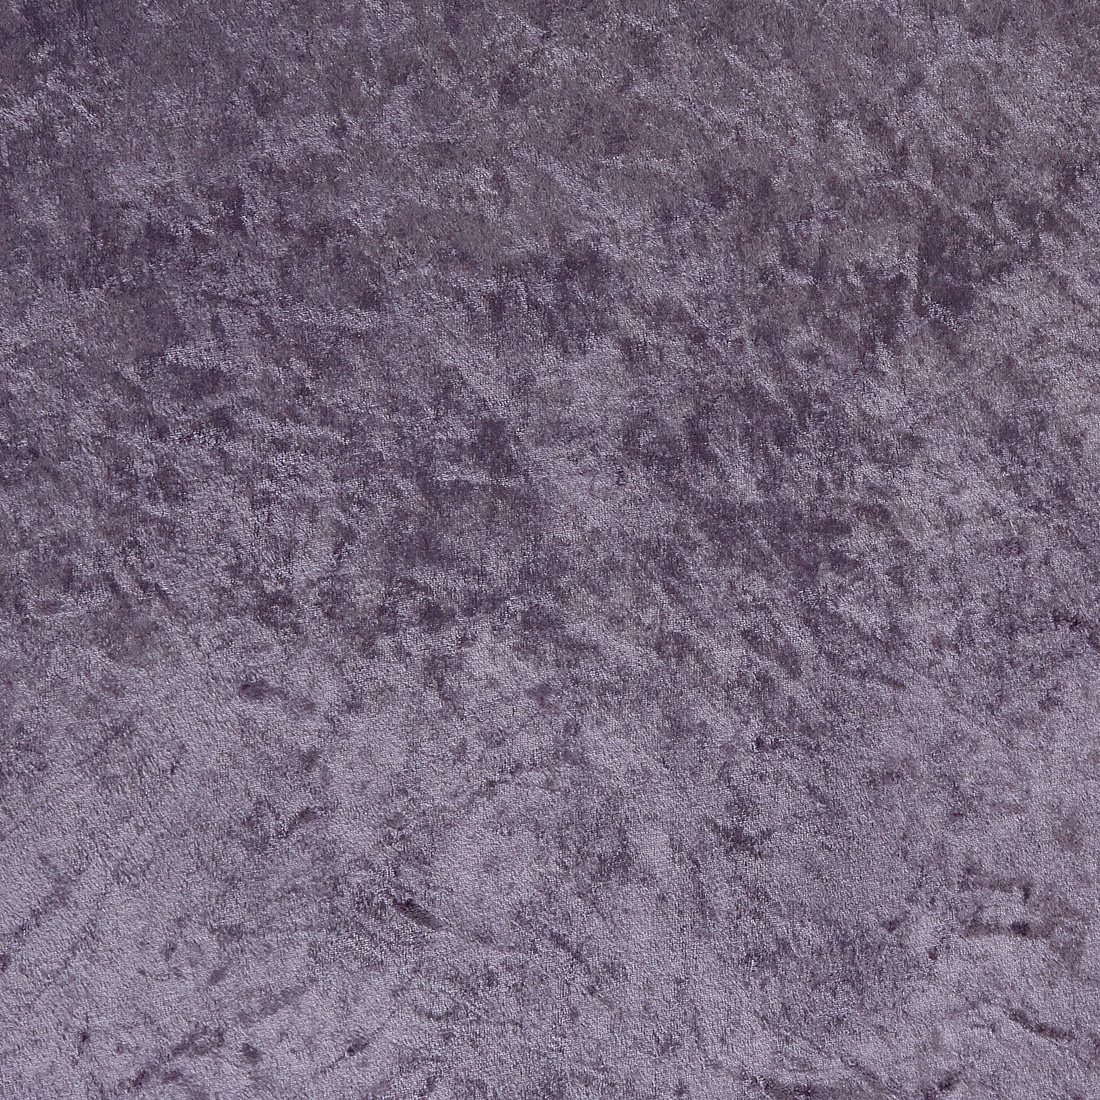 Supercrush Velvet Heather Curtain Fabric